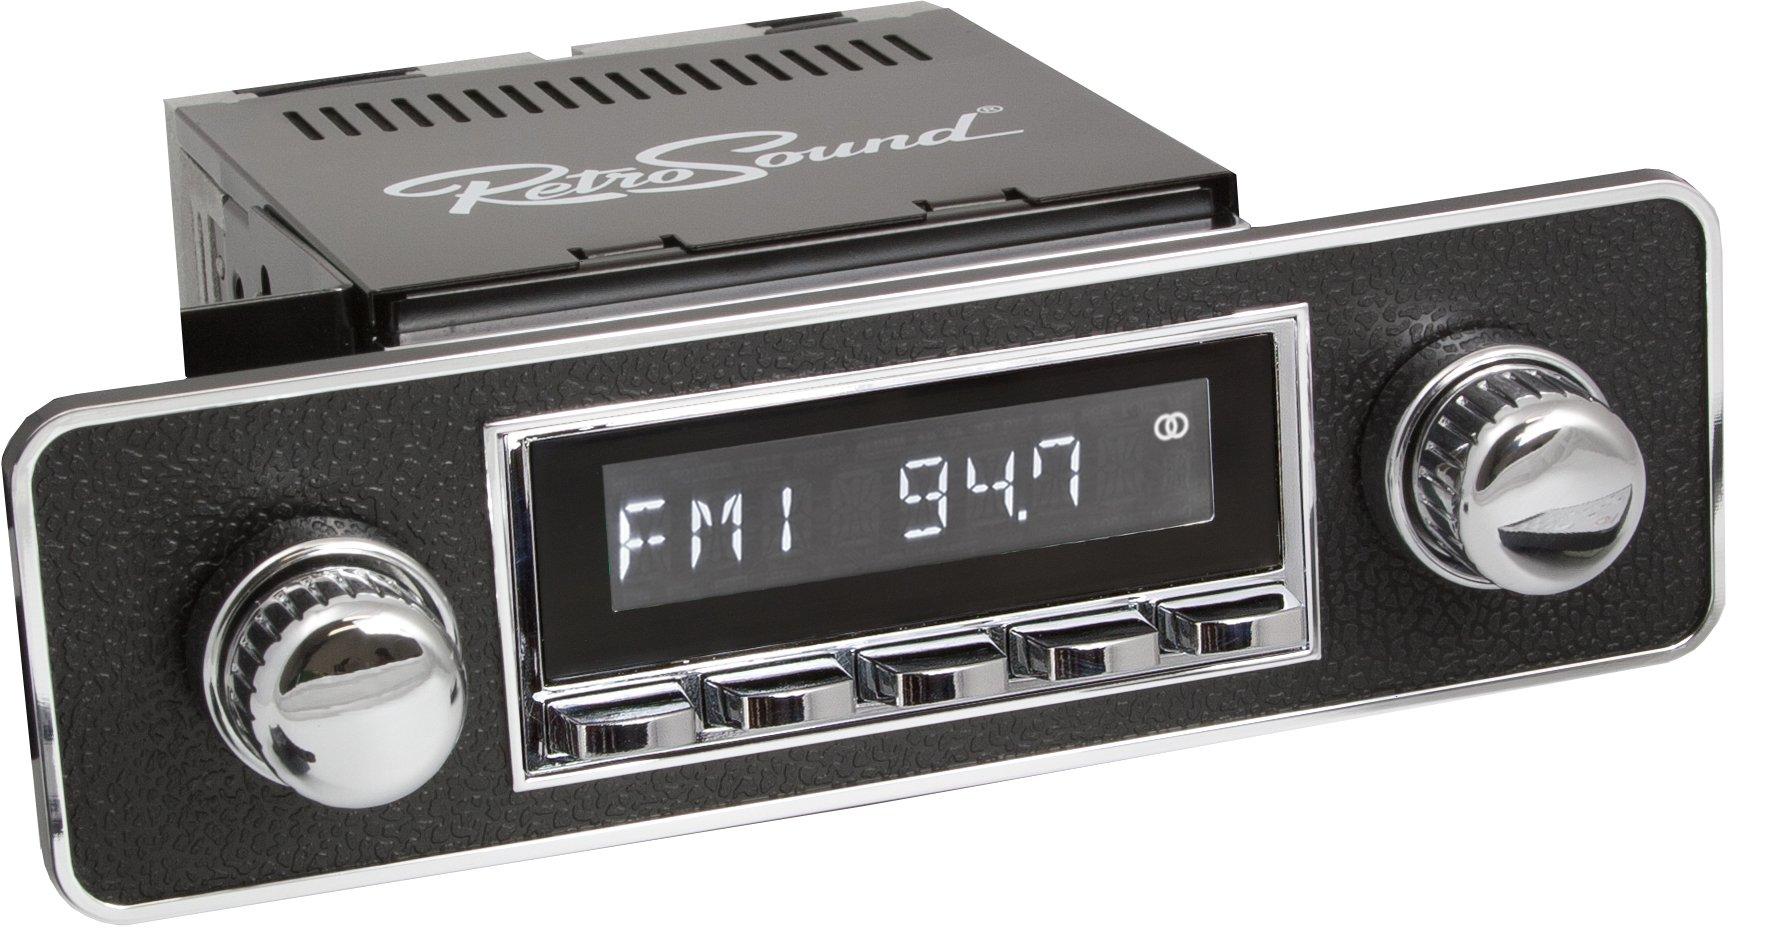 Retro Manufacturing LAC-502-06-76 Car Radio by Retro Manufacturing